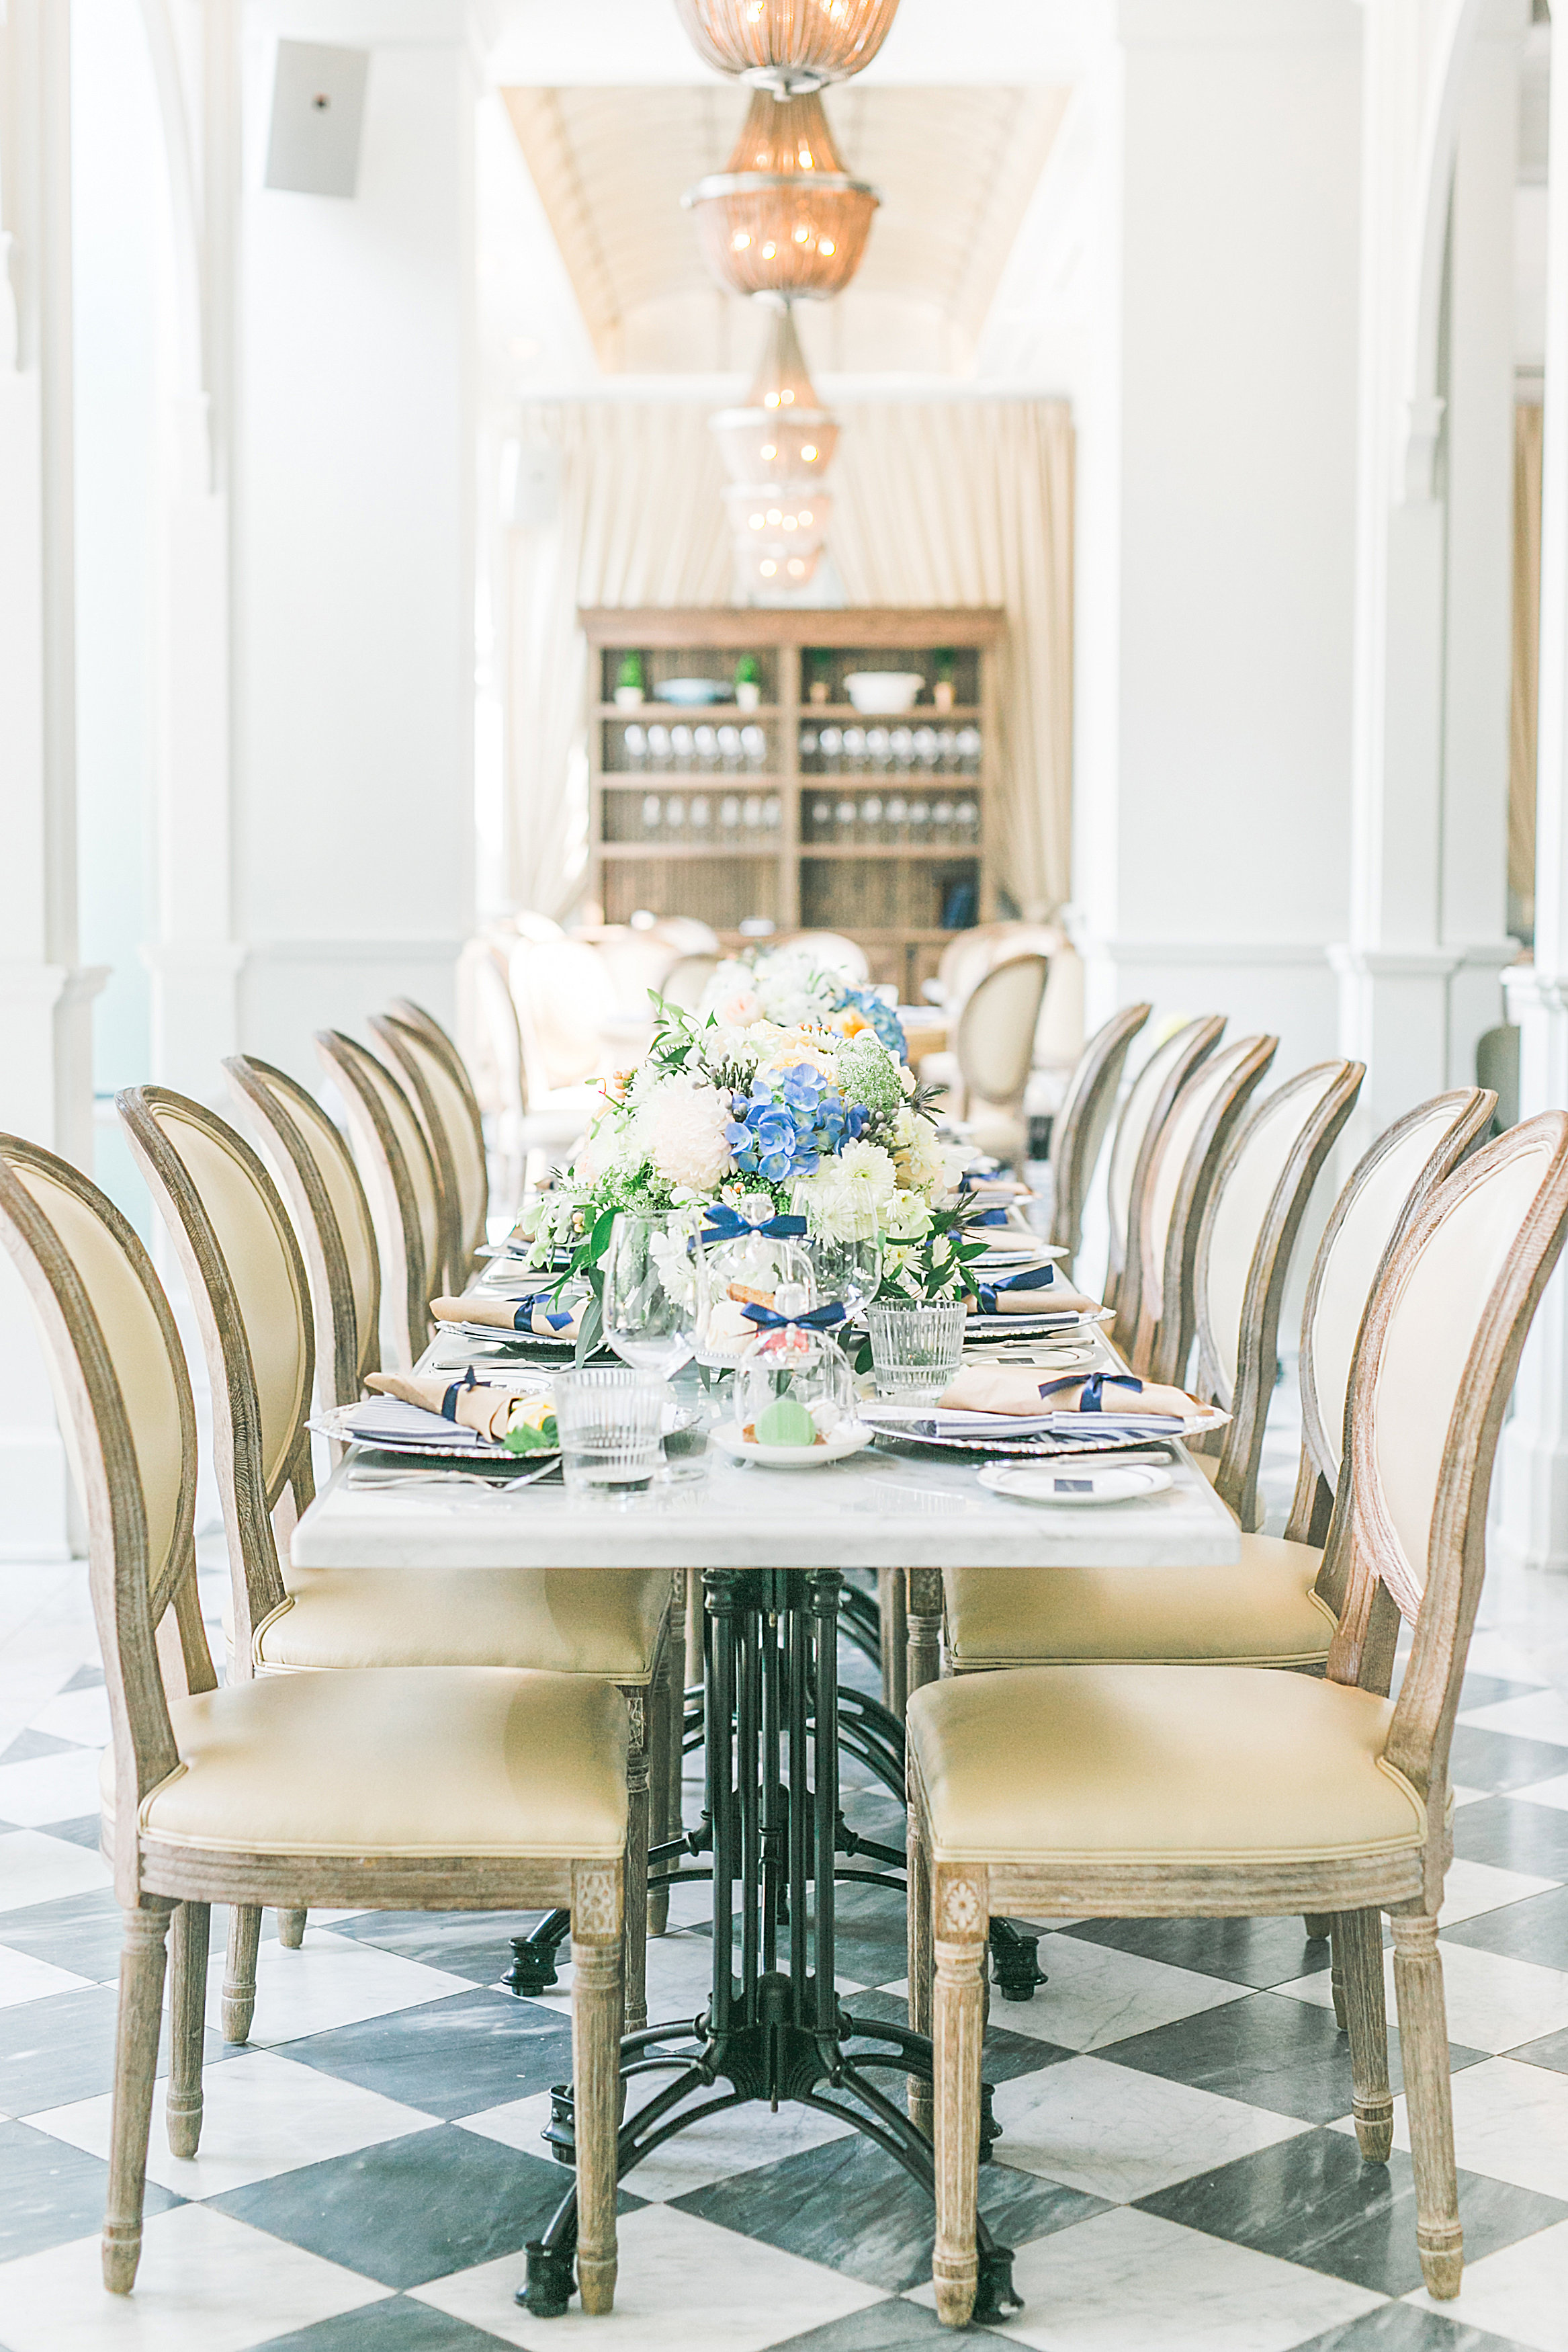 Phoebe Lo Events Toronto Wedding - Colette Cafe The Chase Hospitality Group Parisian Bridal Shower 001.jpg